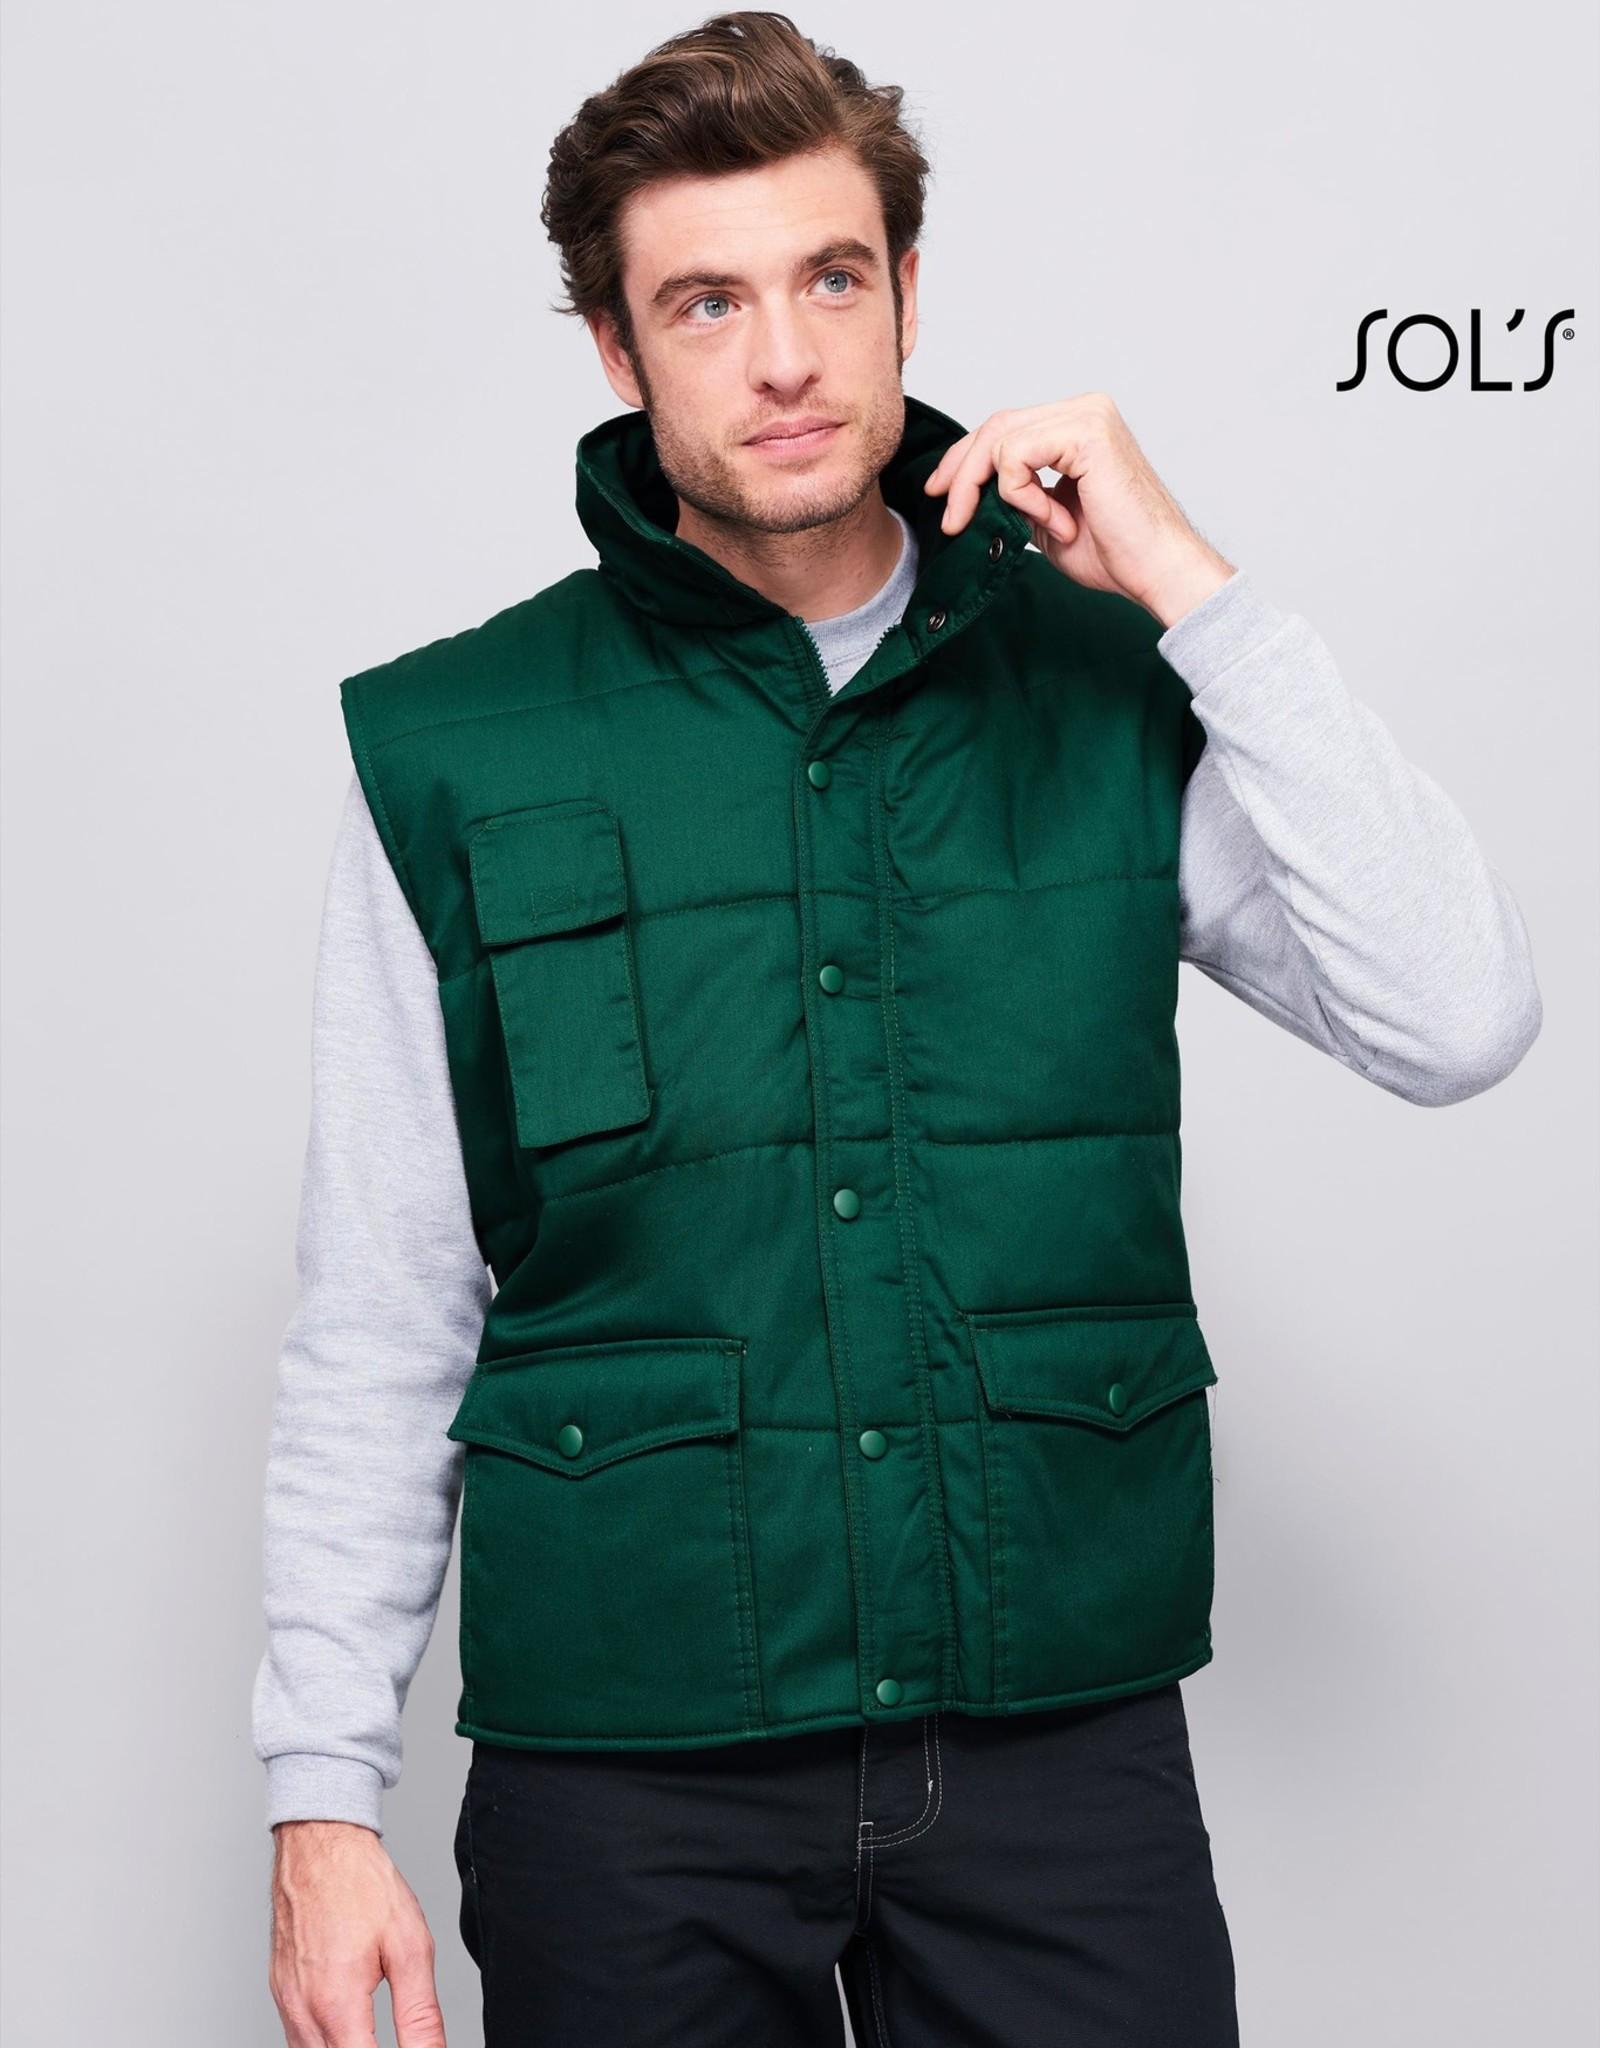 Sol's BODYWARMER 'Equinox' workwear rood